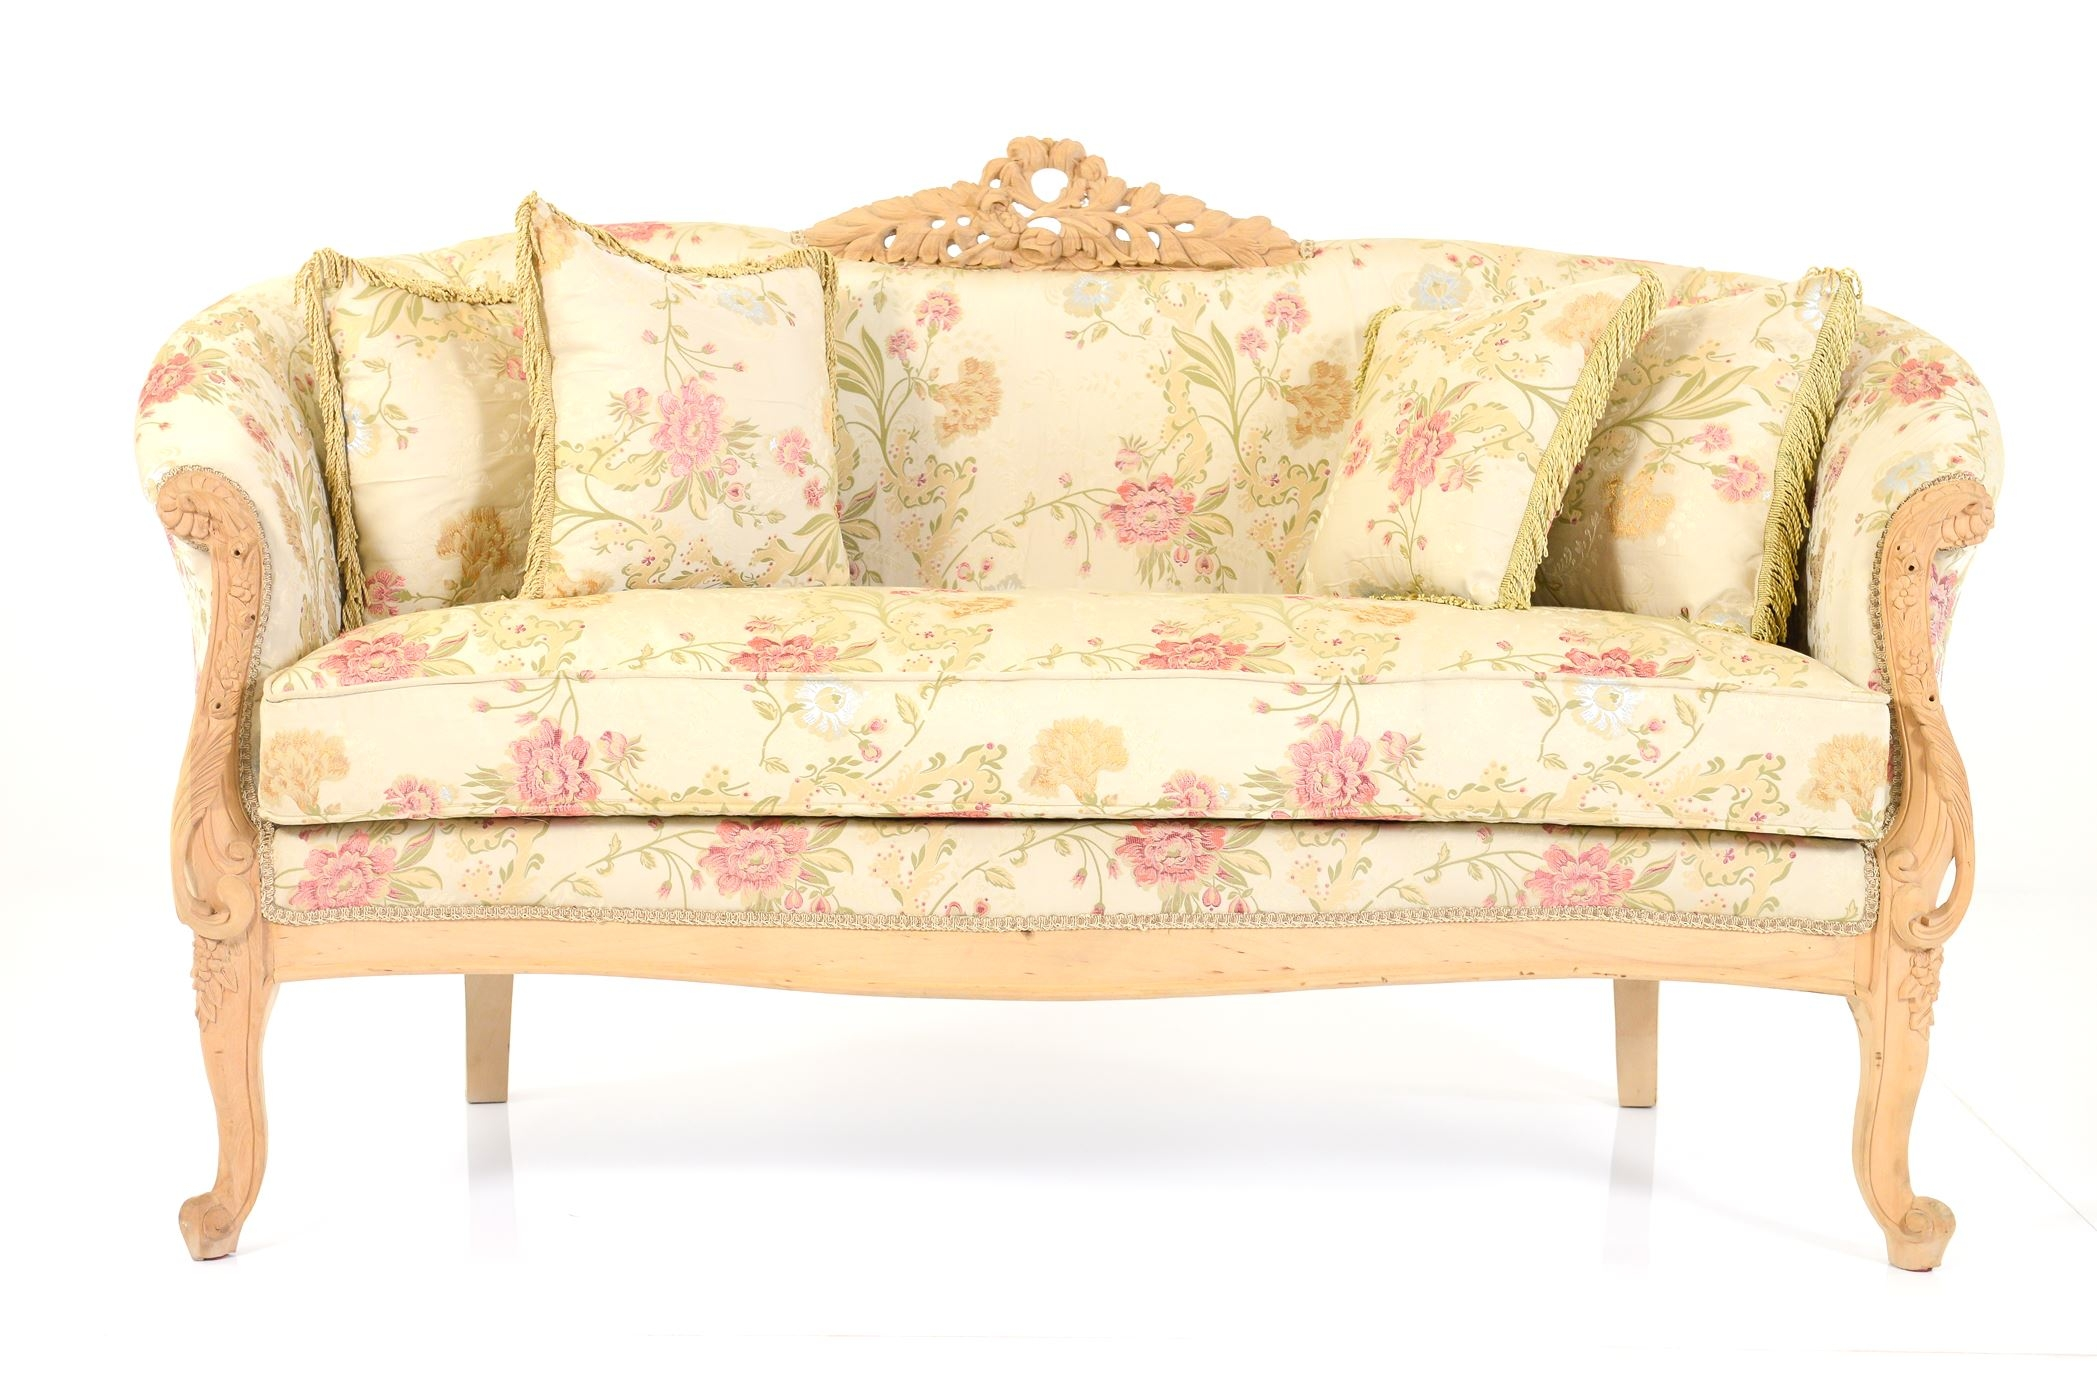 Full Size of Chesterfield Sofa Antik Gebraucht Kaufen Couch Leder Bali Stil Sofas Big Optik Malaysia Ledersofa Braun Antiklederoptik Murah Look Erpo Sam 2er De Sede Billig Sofa Sofa Antik